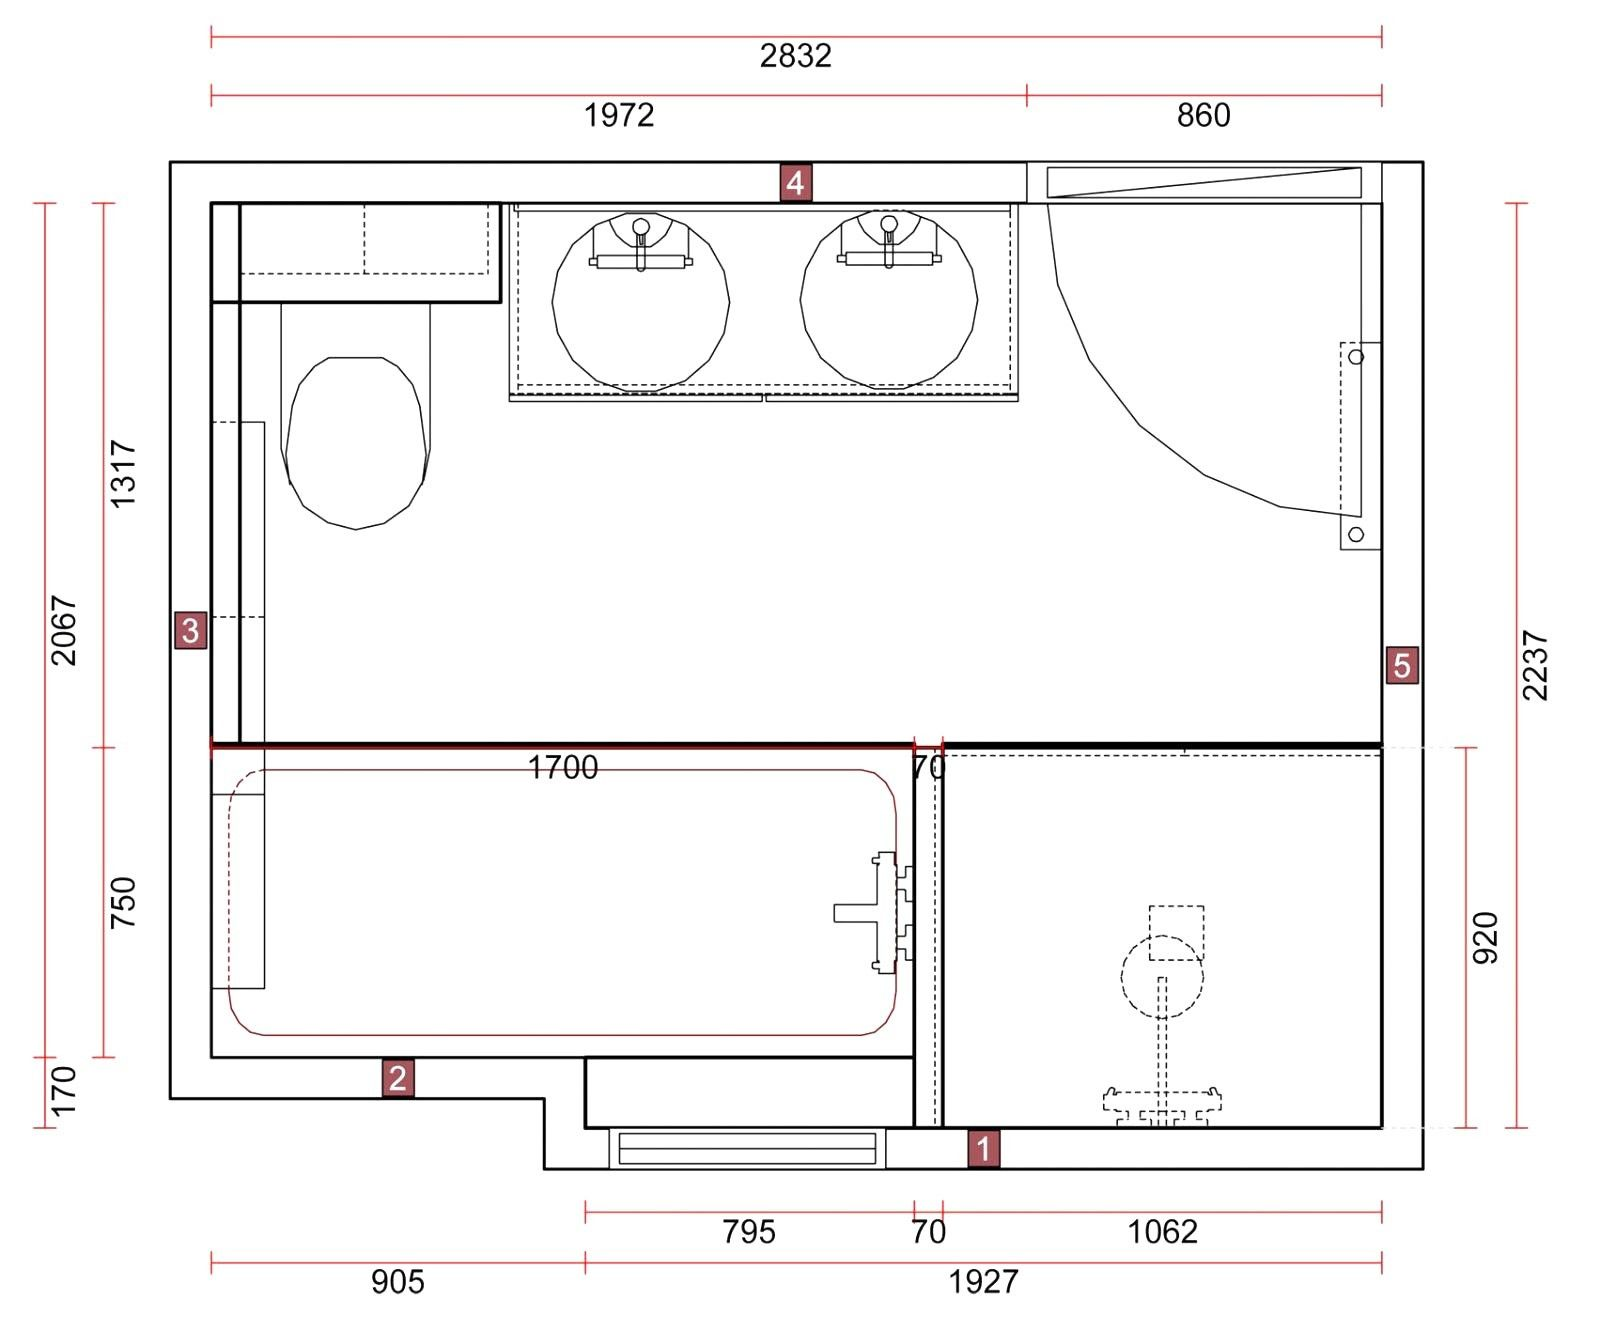 Epingle Par Aryose Sur Salle De Bain Plan Salle De Bain Design De Salle De Bain Salle De Bain